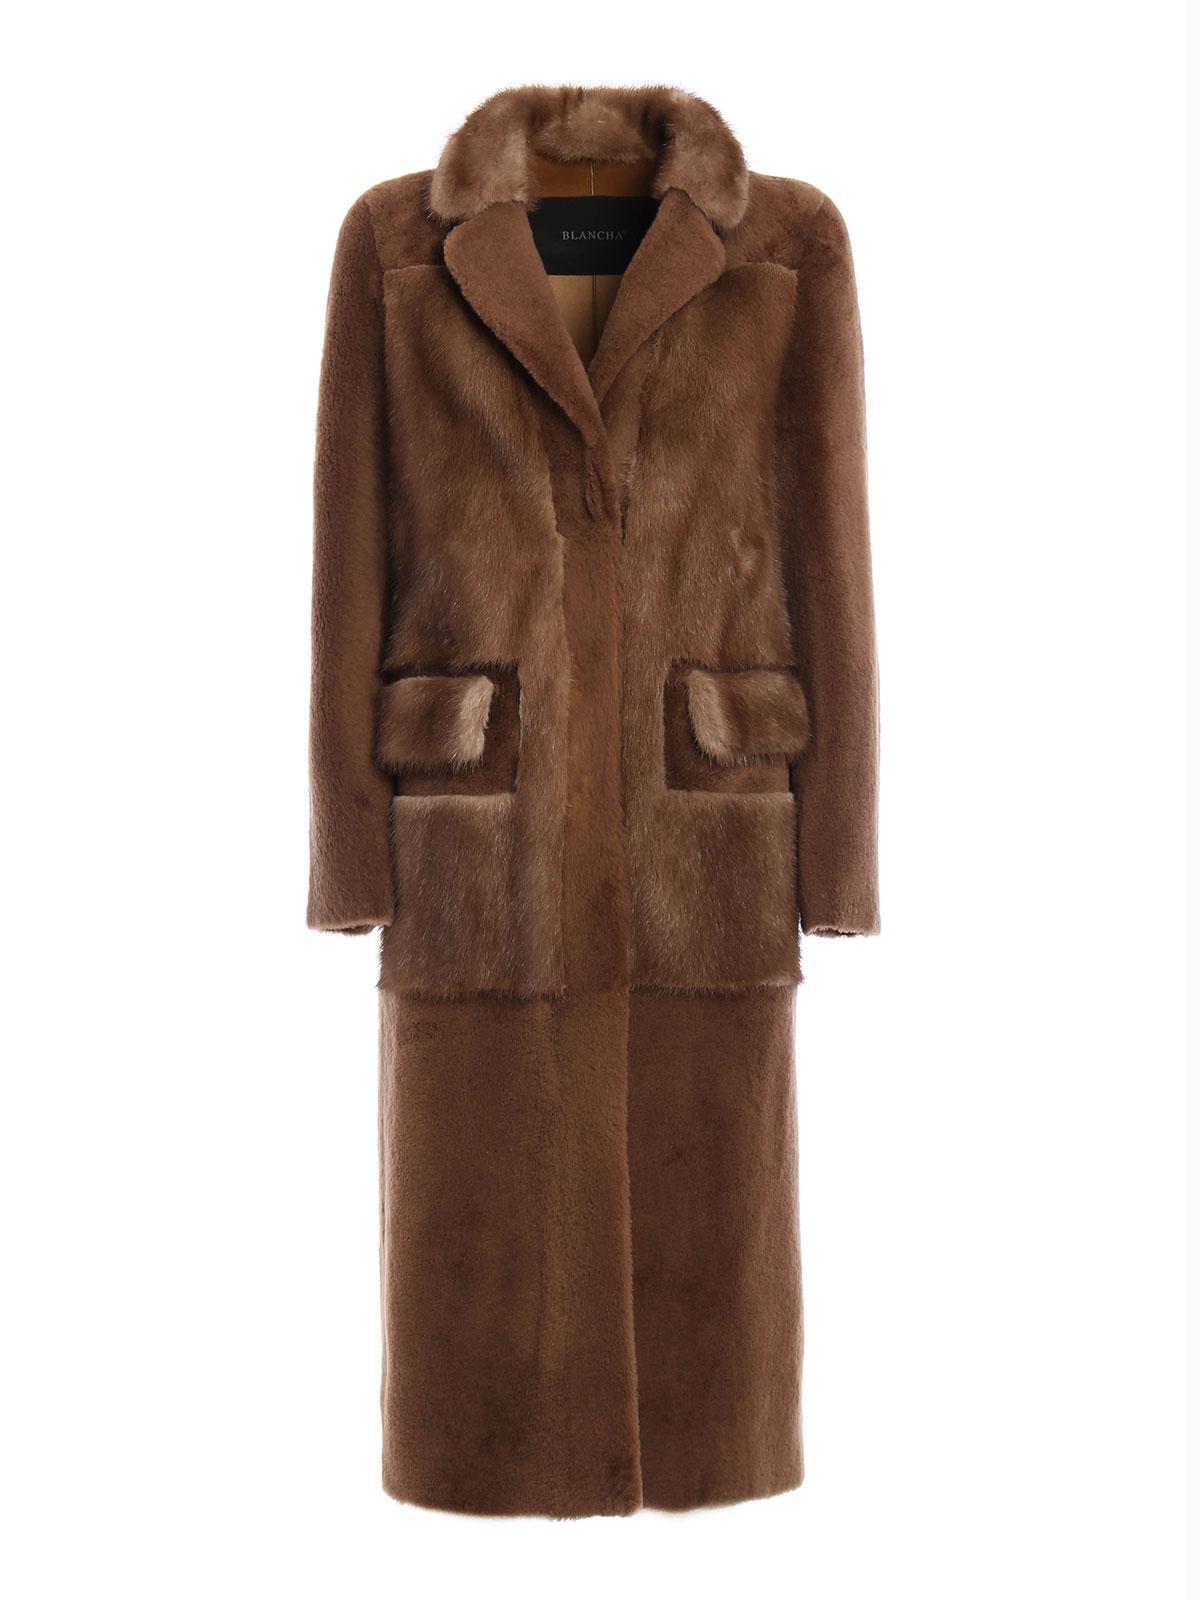 Mink detailed merinos fur long coat by Blancha - Fur & Shearling ...